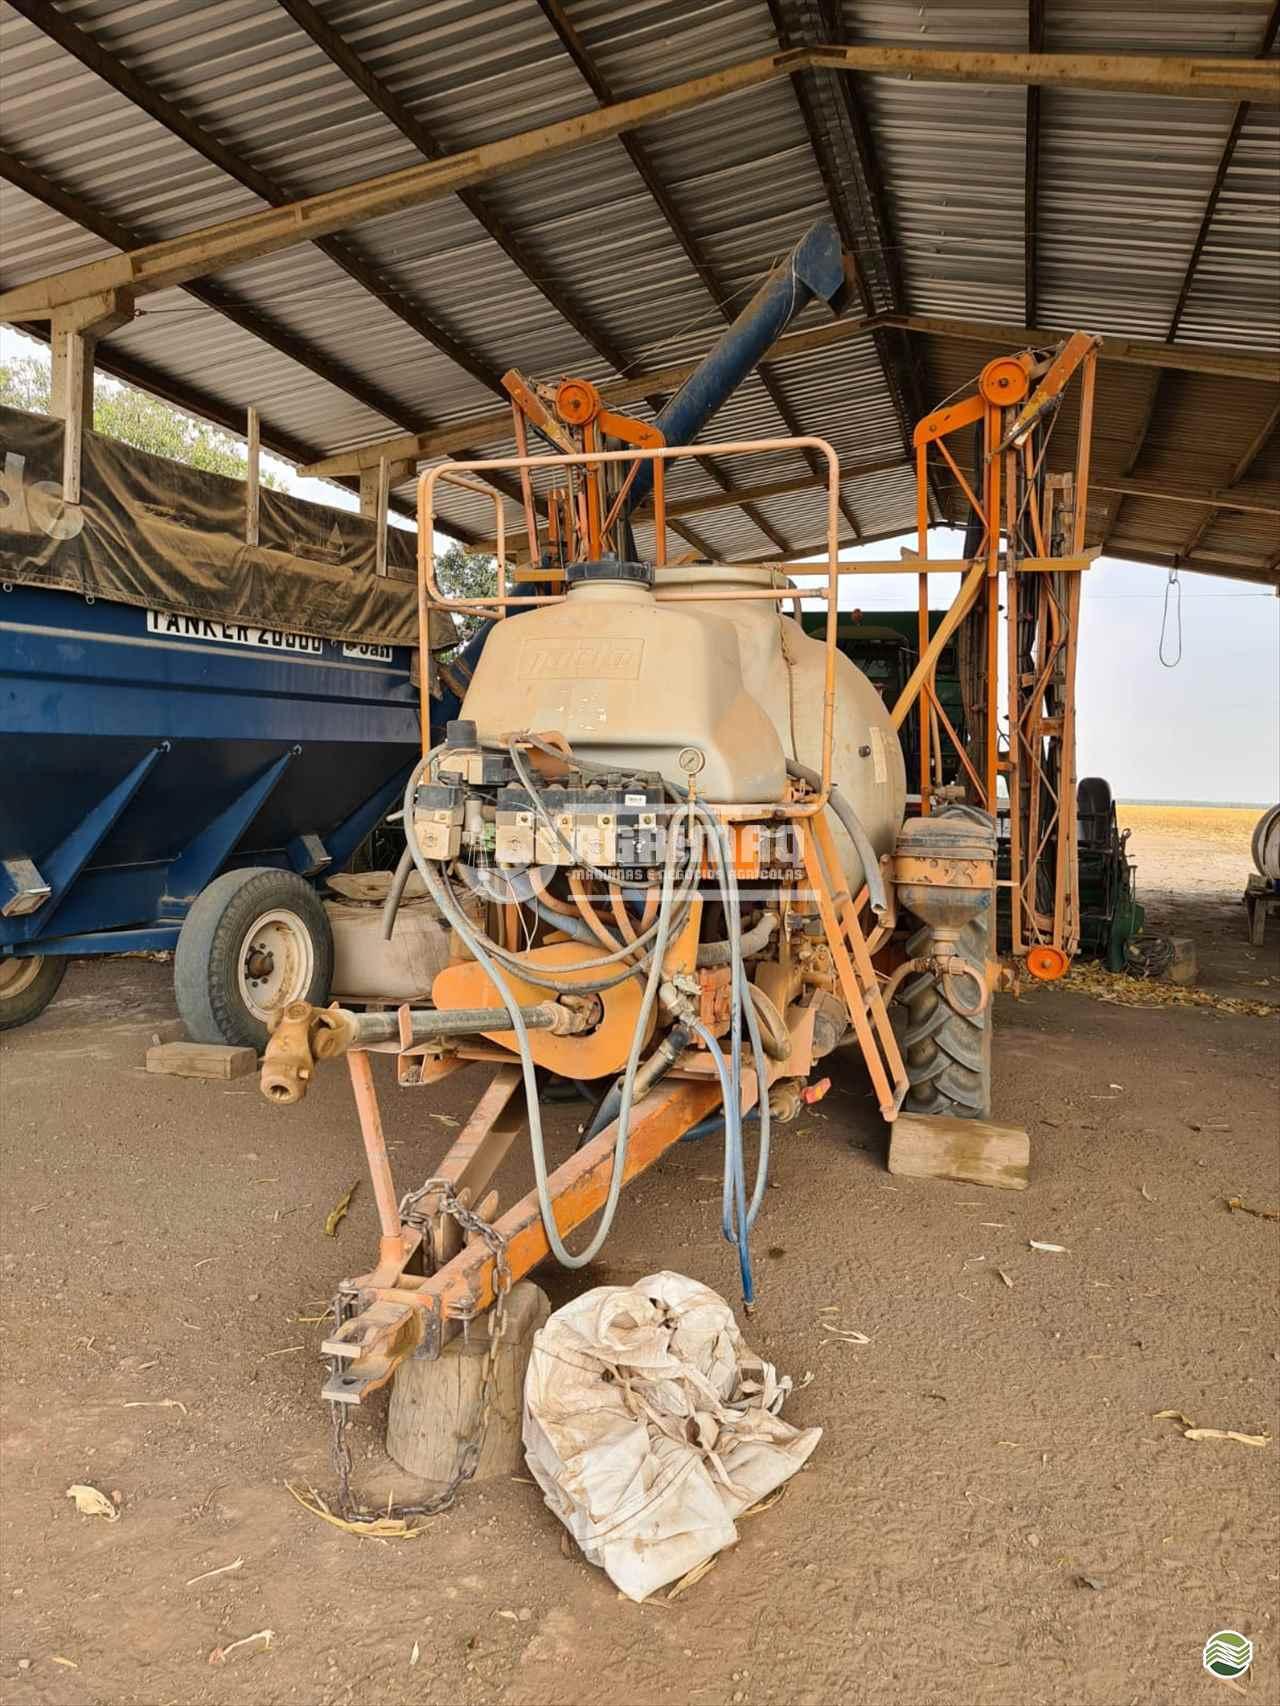 ADVANCE 2000 AM18 VORTEX de Agrimaq Máquinas e Implementos Agrícolas - LUCAS DO RIO VERDE/MT